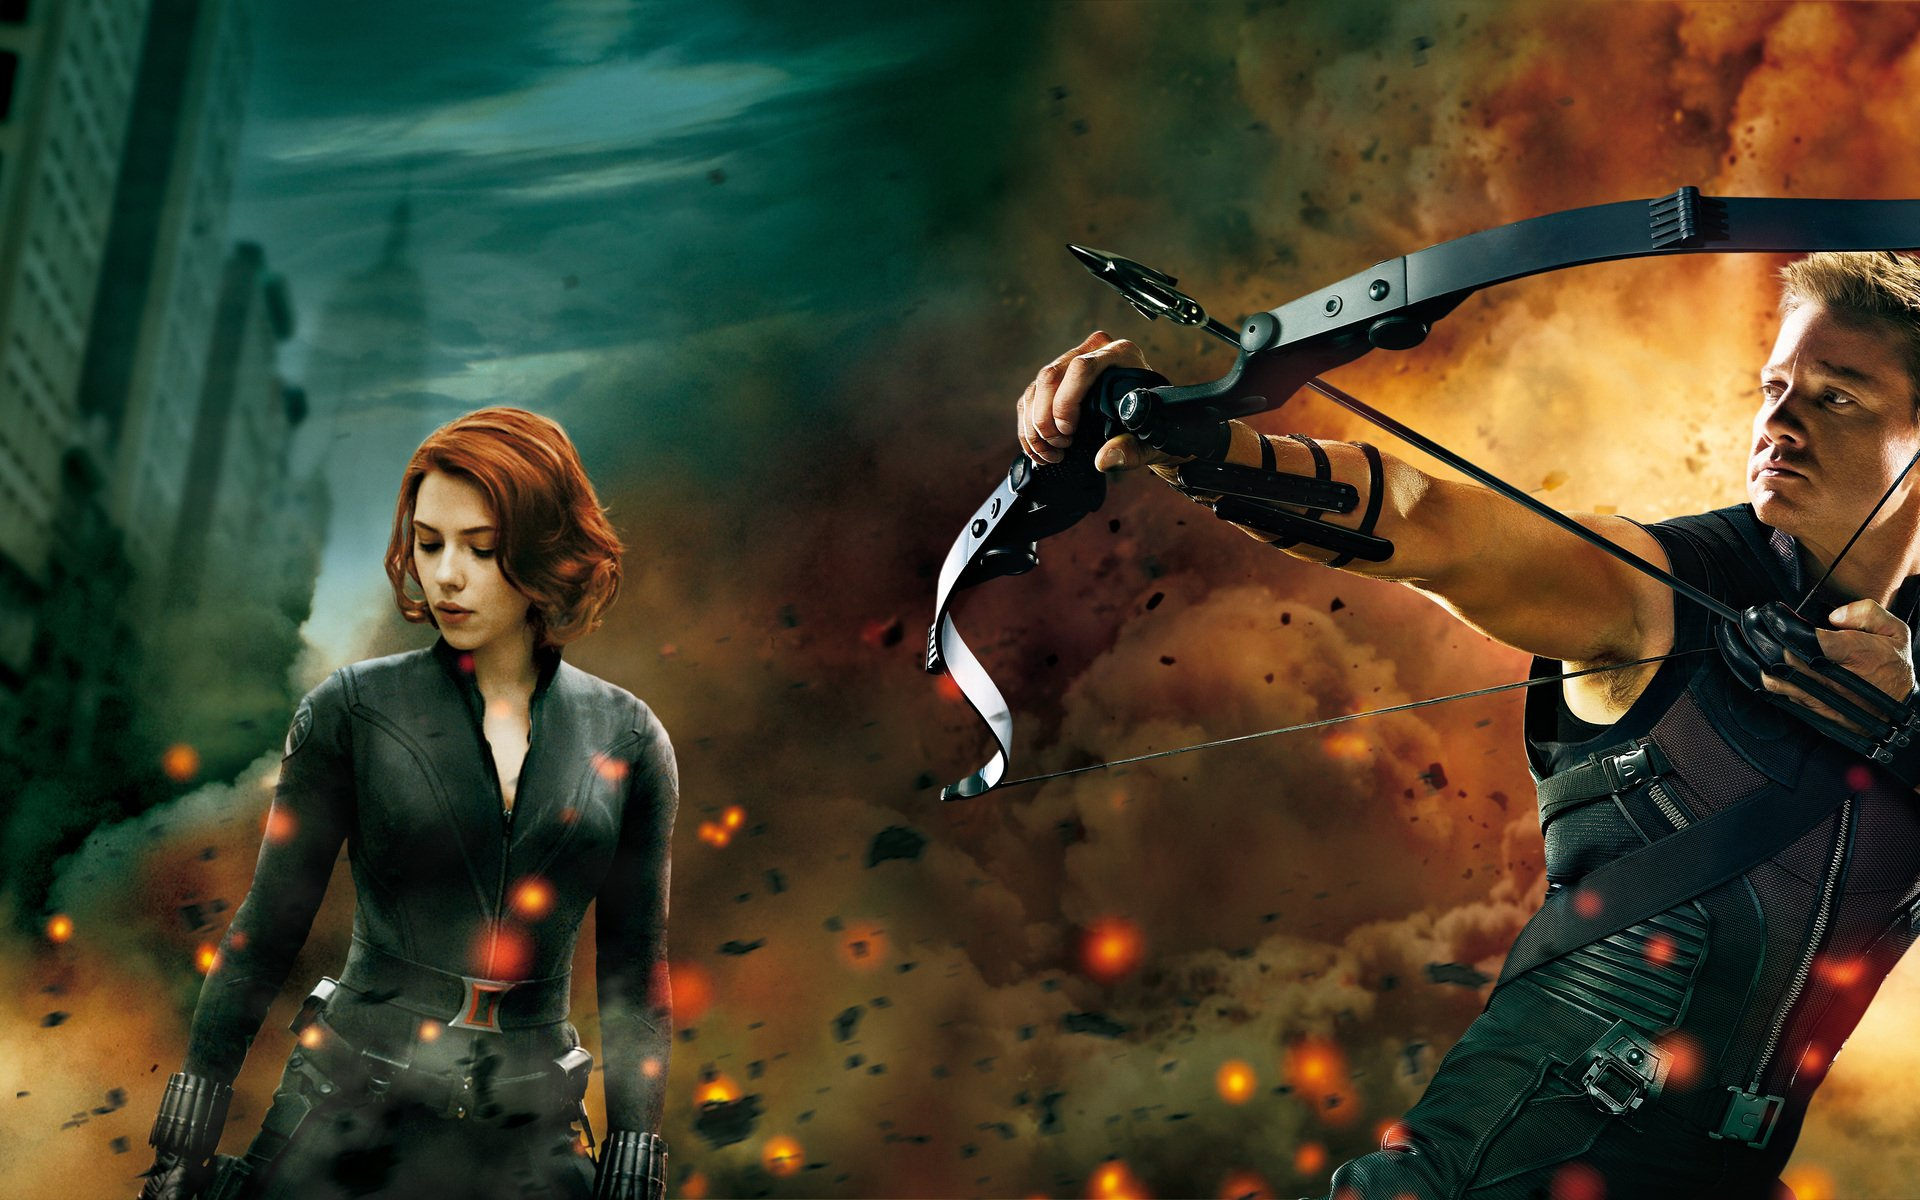 Movie - The Avengers  Hawkeye Black Widow Scarlett Johansson Jeremy Renner Natasha Romanoff Wallpaper